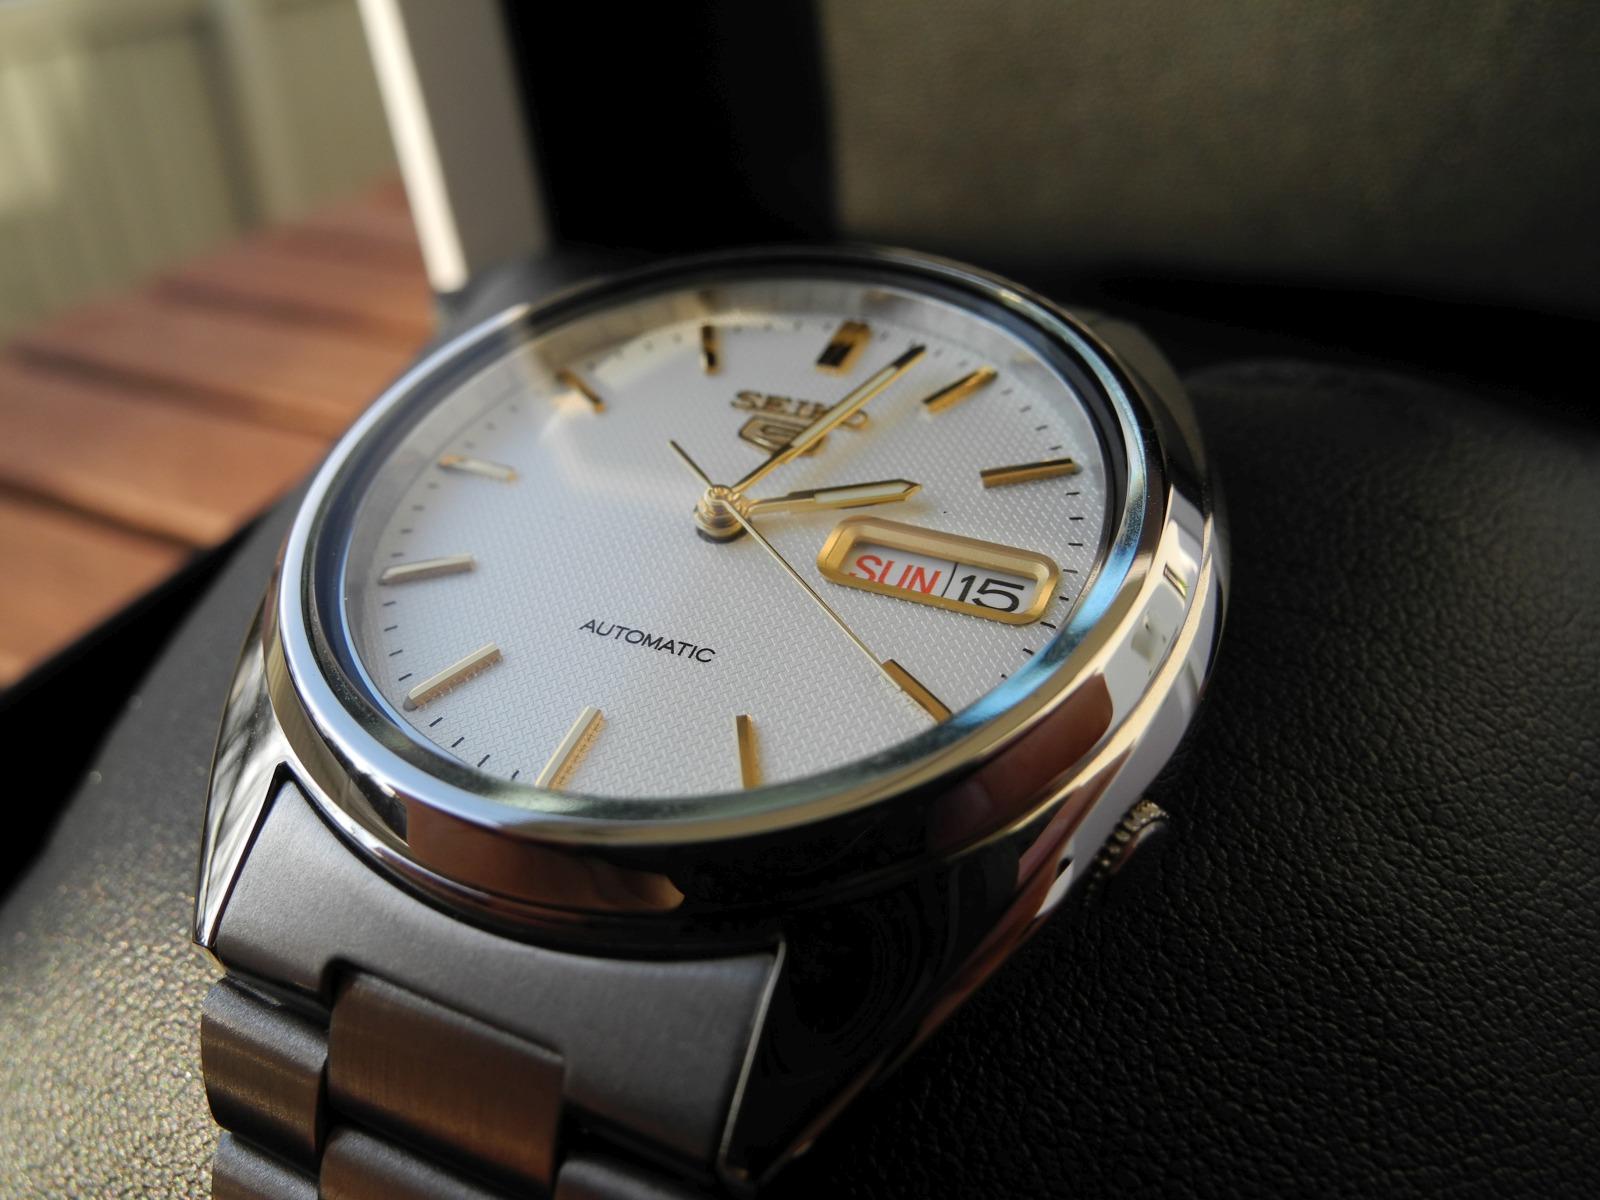 erledigt  seiko 5 men u0026 39 s automatic watch - snxg47k